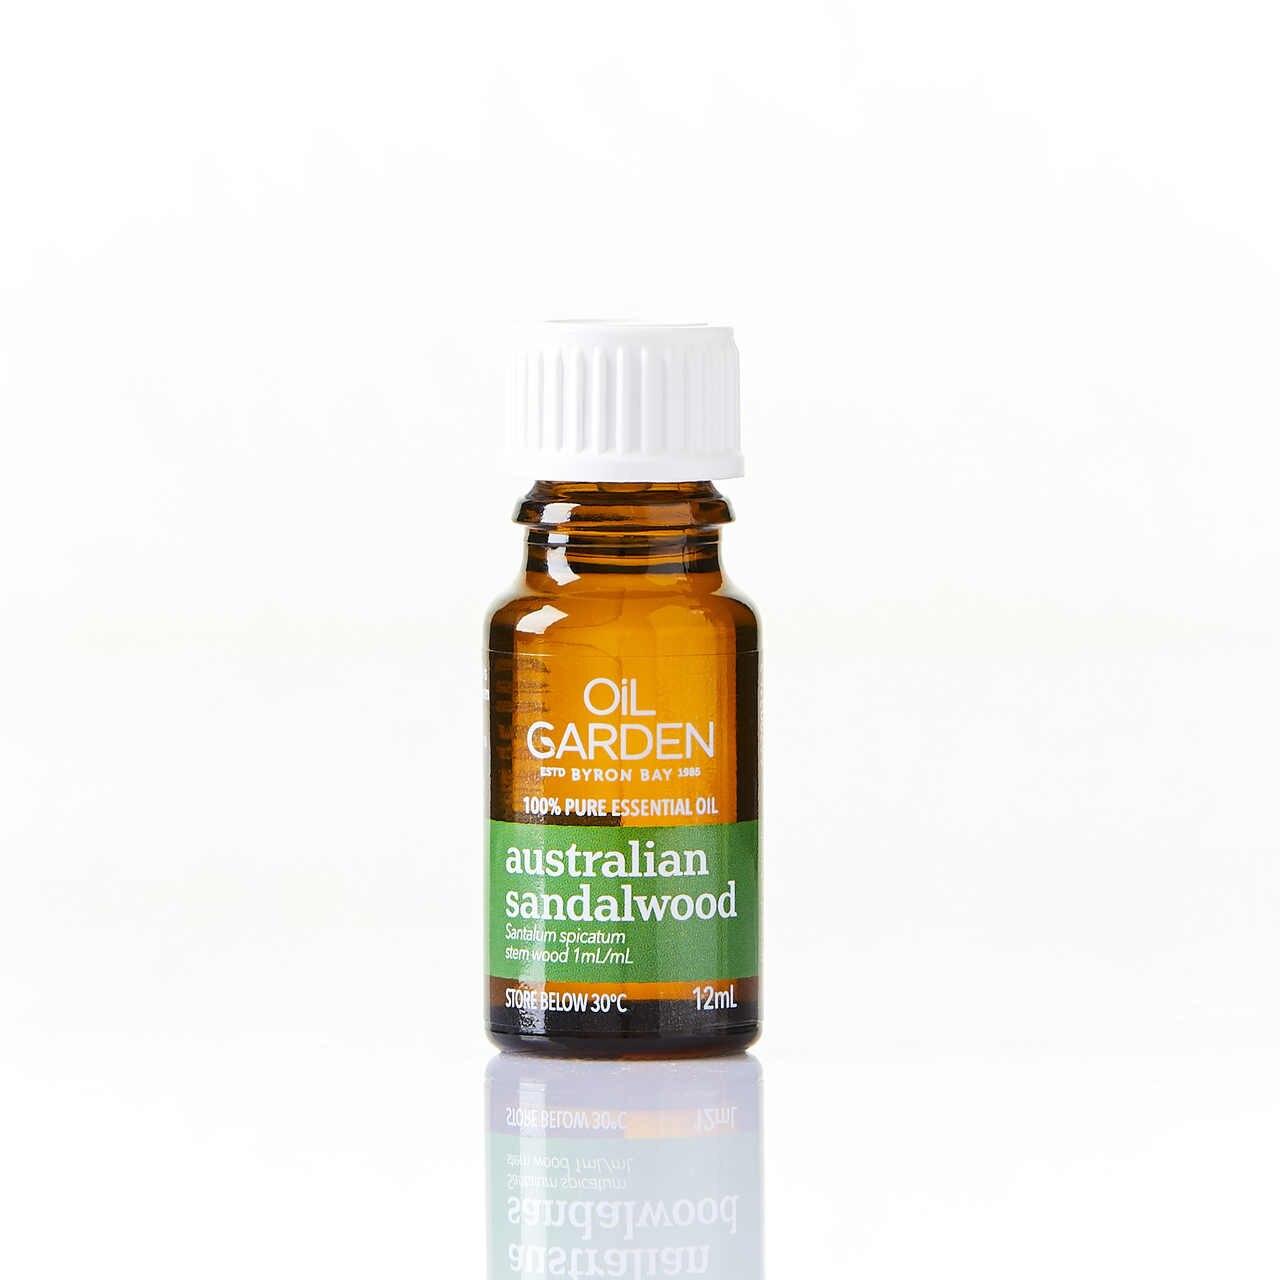 Oil Garden Australian Sandalwood Pure Essential Oil 12mL 6620031